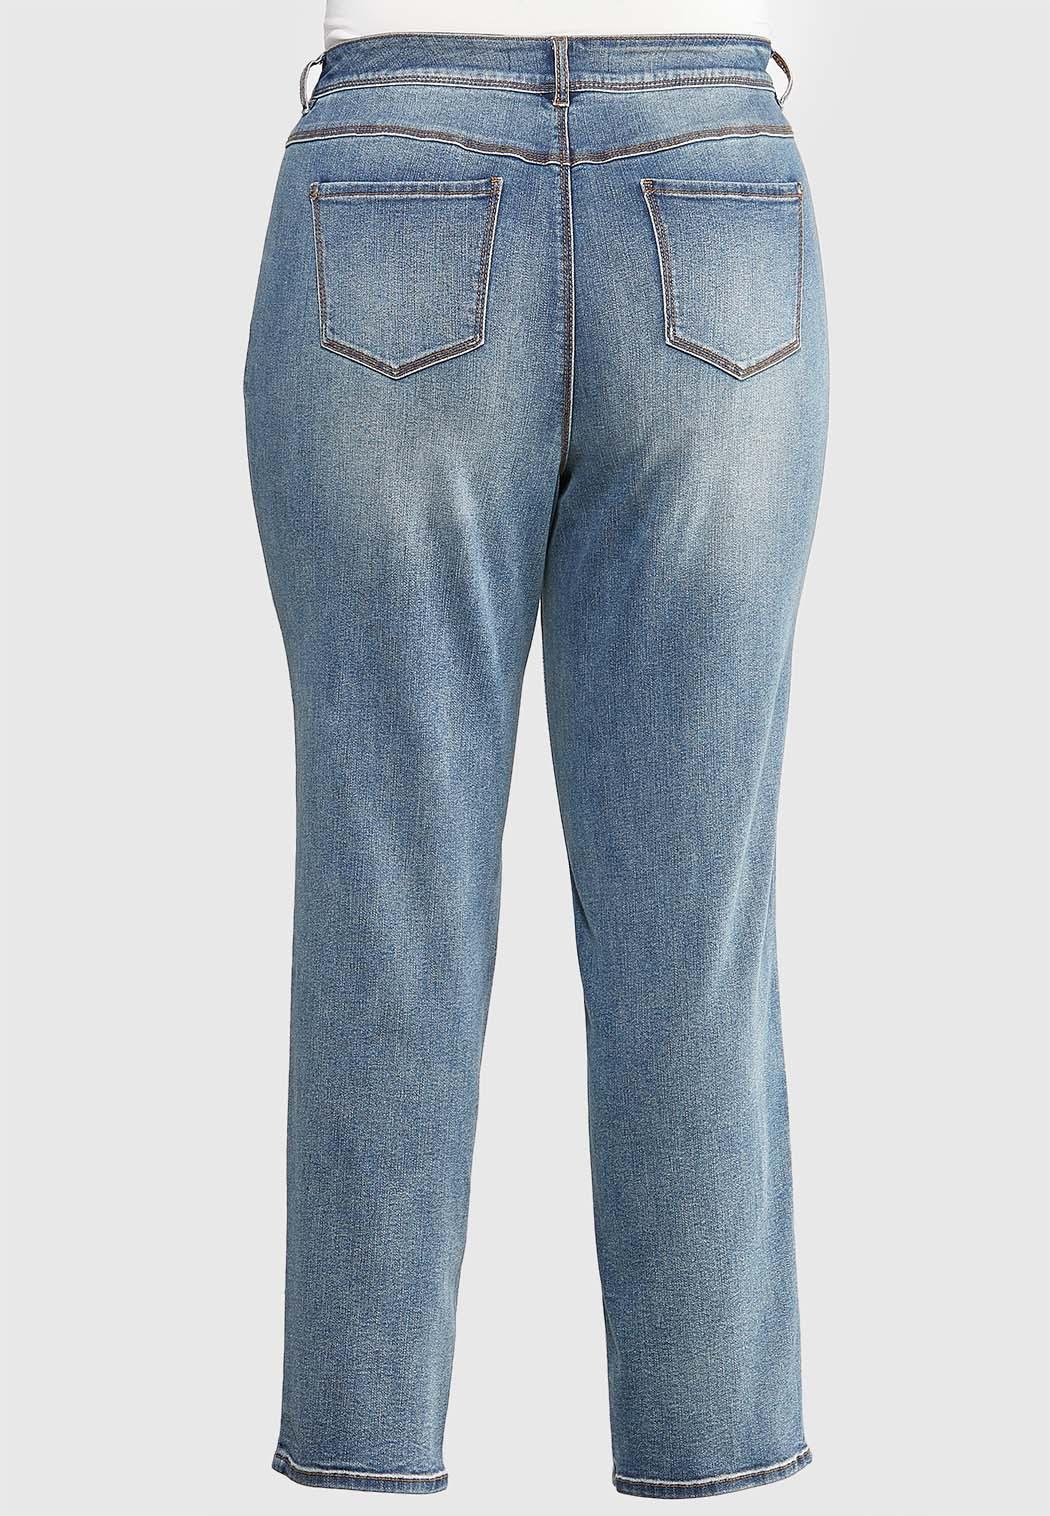 Plus Size Medium Wash Straight Leg Jeans (Item #43993775)